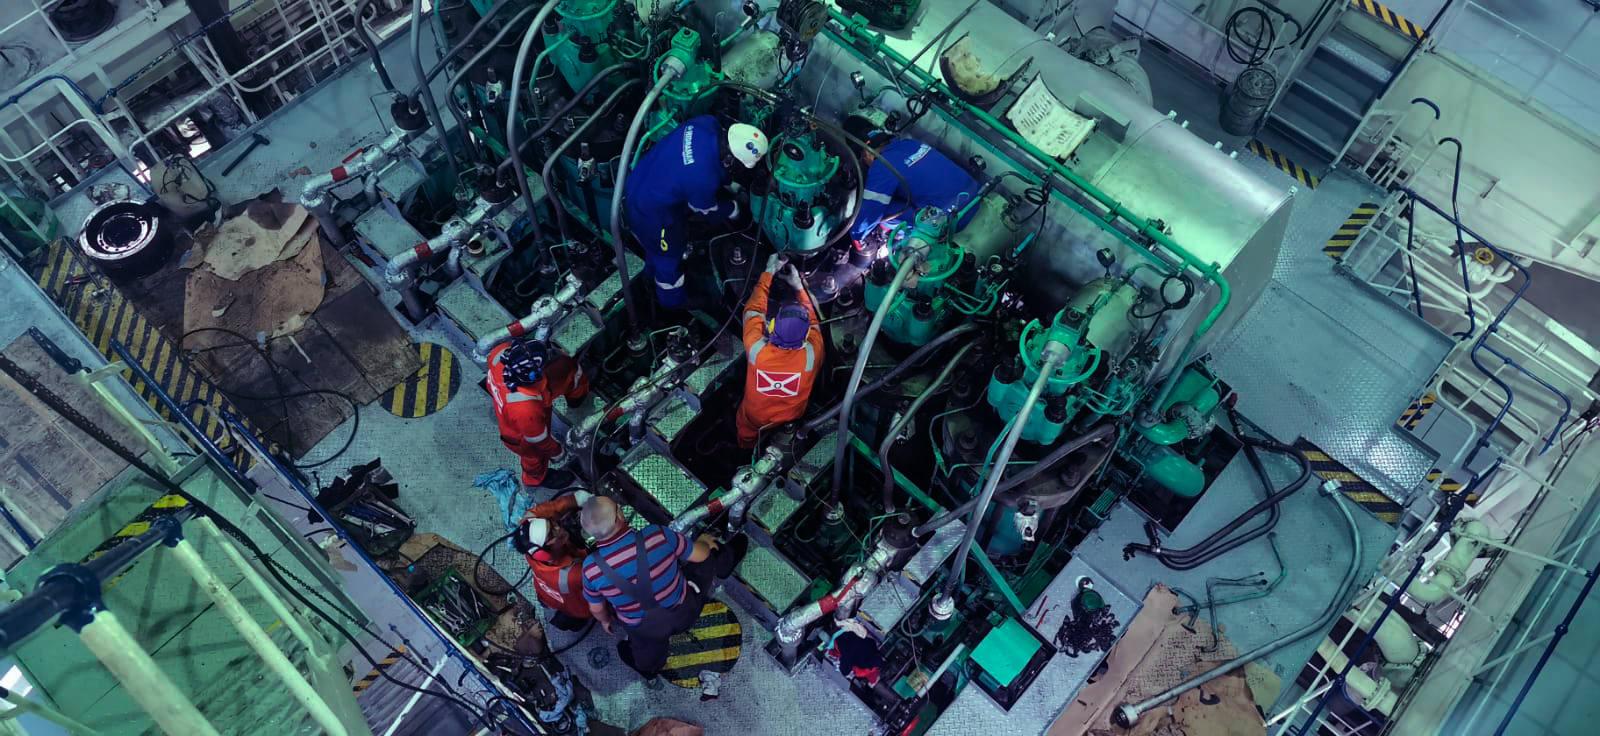 Vessel Main engine overhaul vessel Liberty